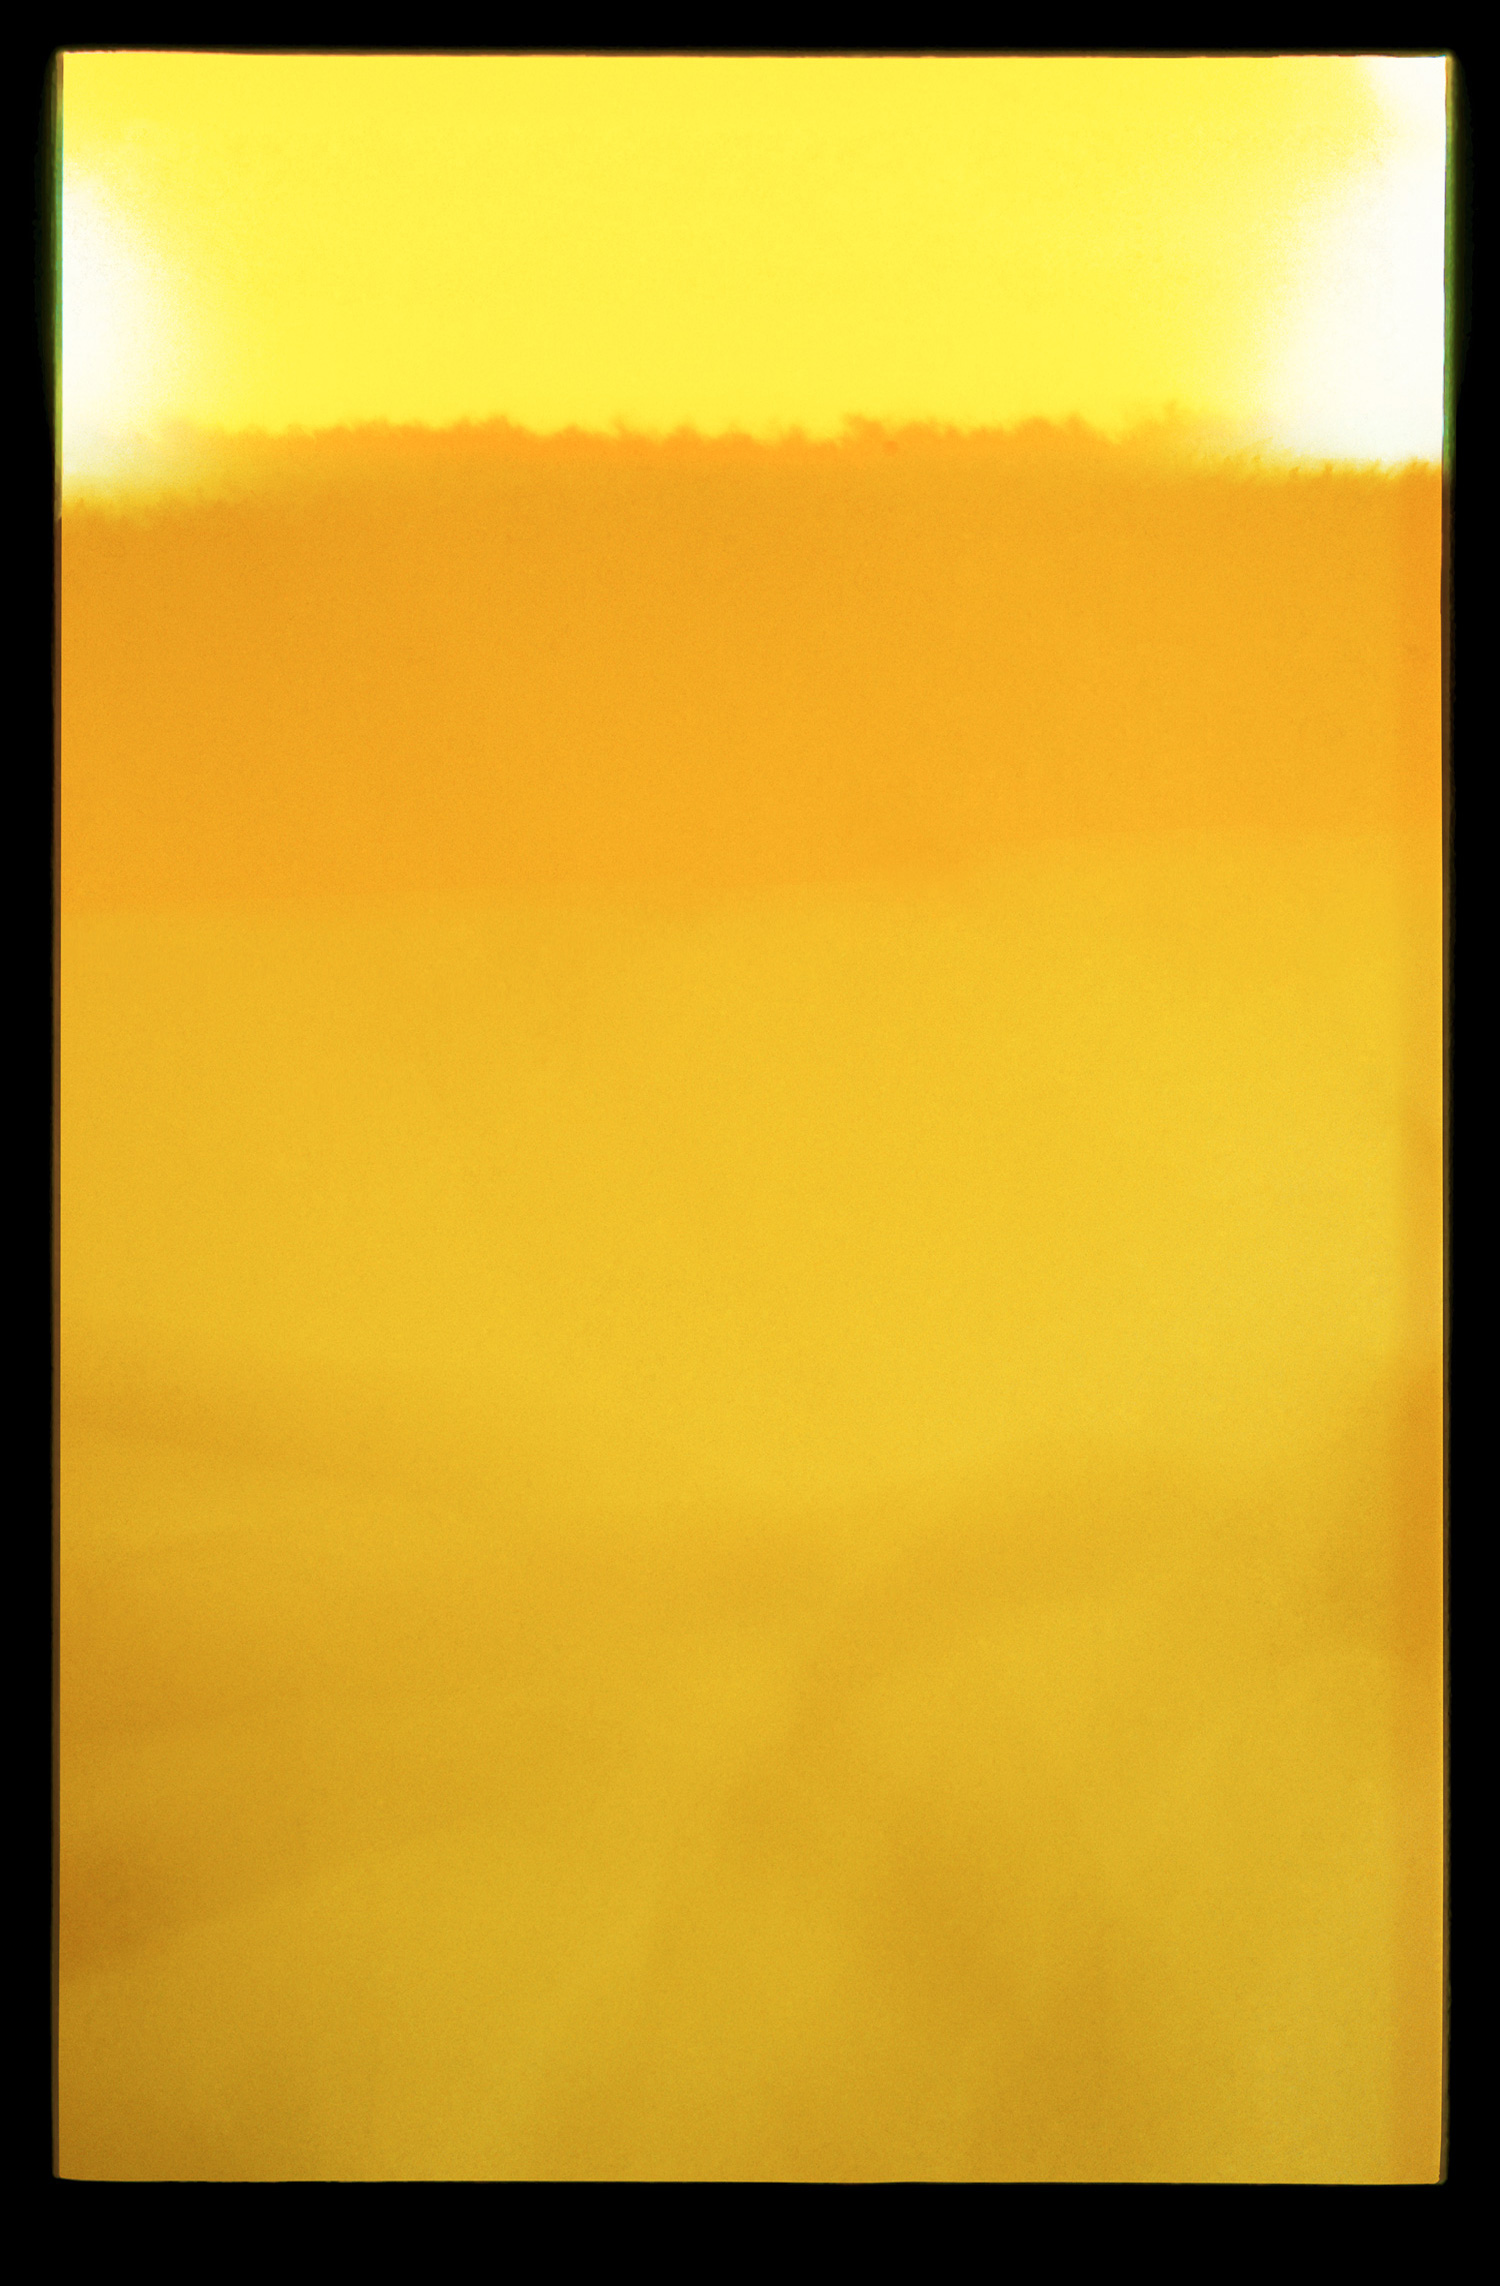 Endings - Kodachrome 5045, No.00. 13/01/1972